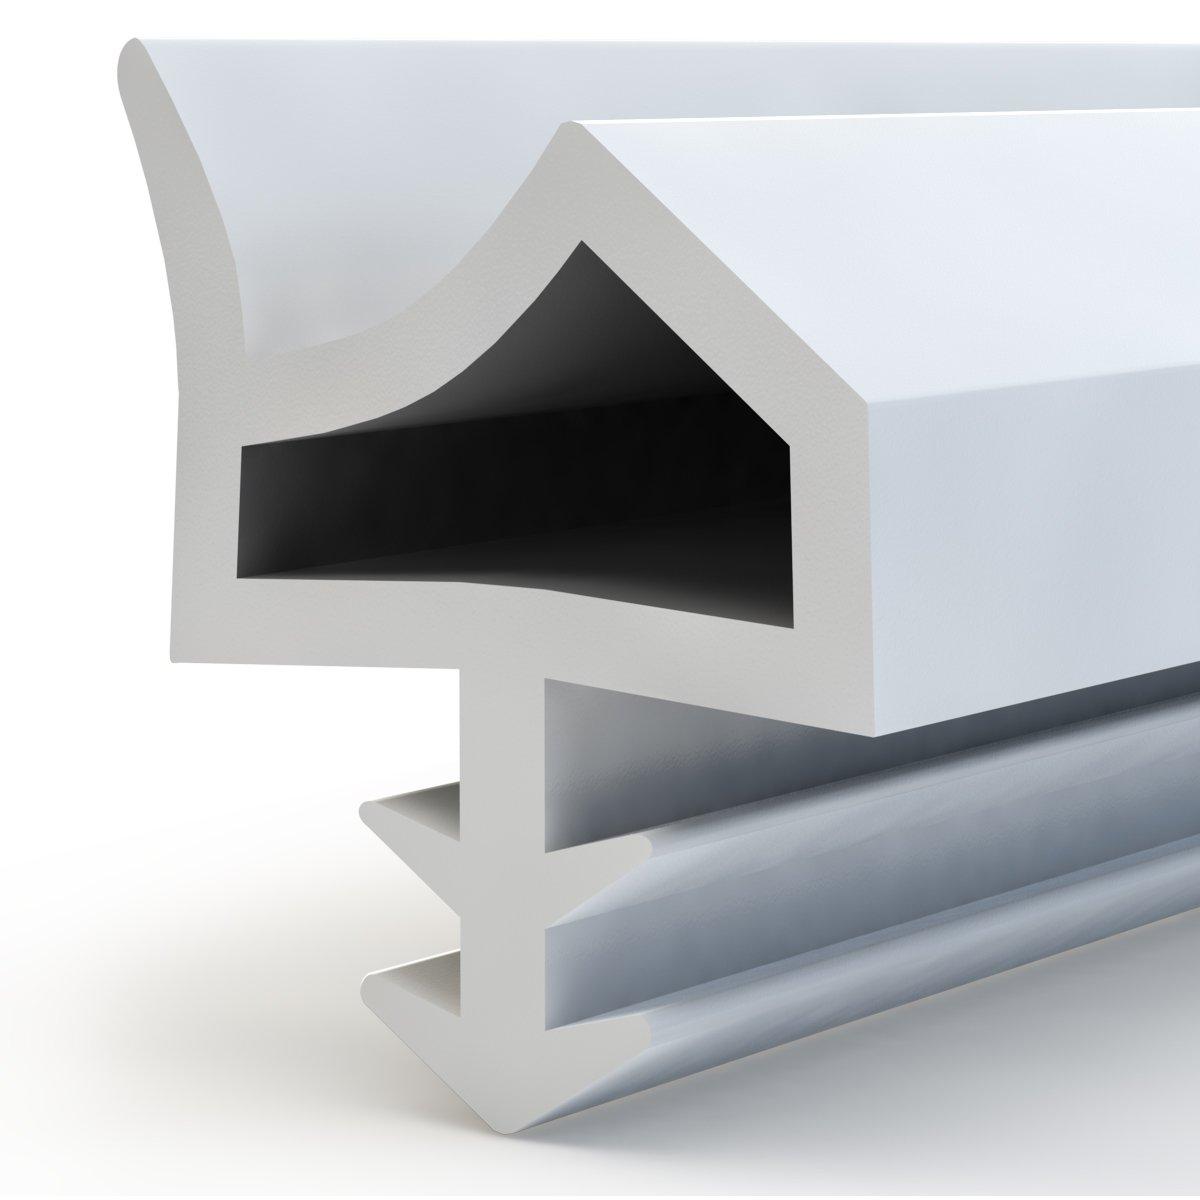 t rdichtung weiss zimmert rdichtung holzzarge jumbo shop. Black Bedroom Furniture Sets. Home Design Ideas